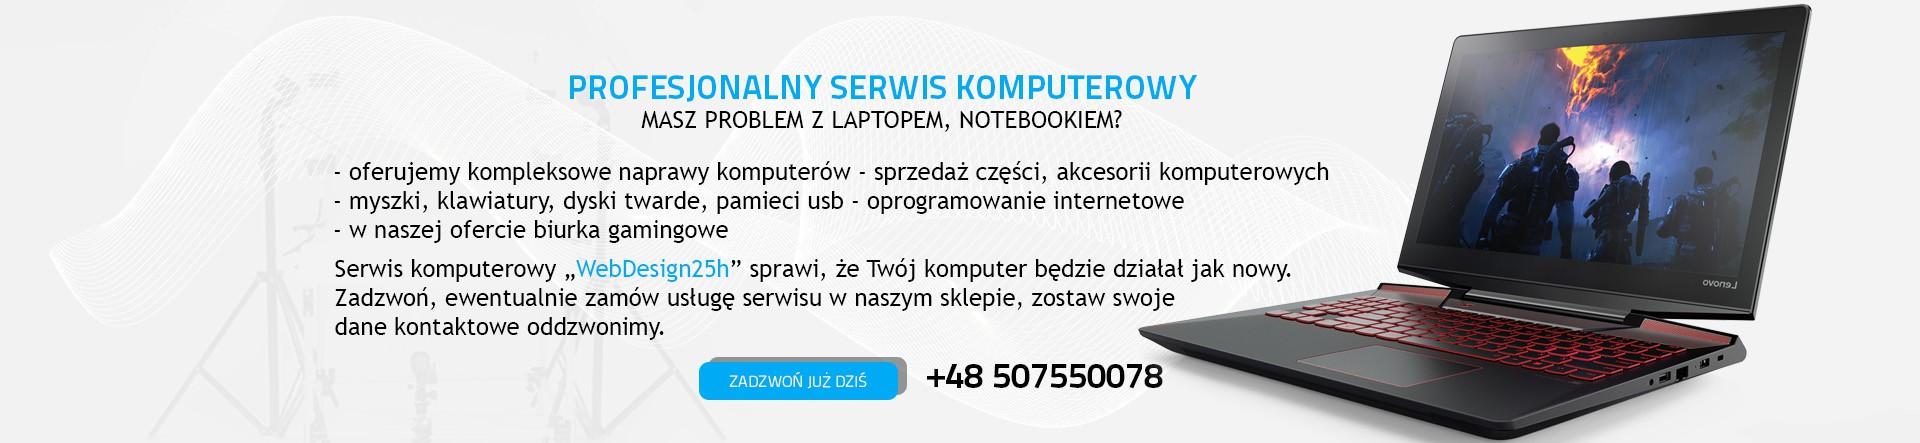 WebDesign25h Kamil Mazan